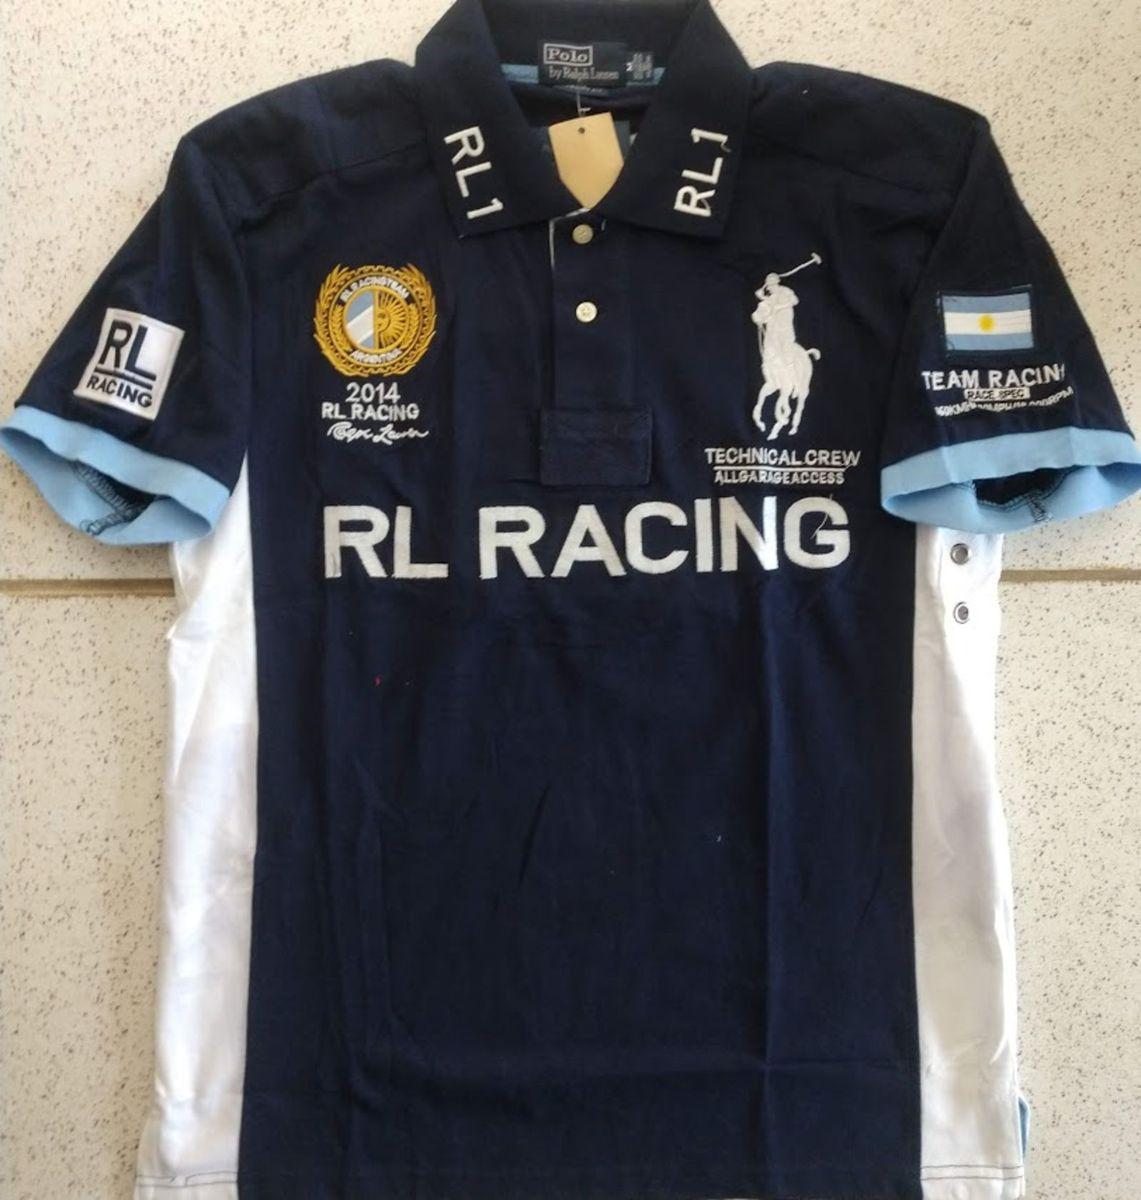 Lauren Ralph M Lamartina Camisa Argentina Tam Polo Marinho Azul F1clKJ